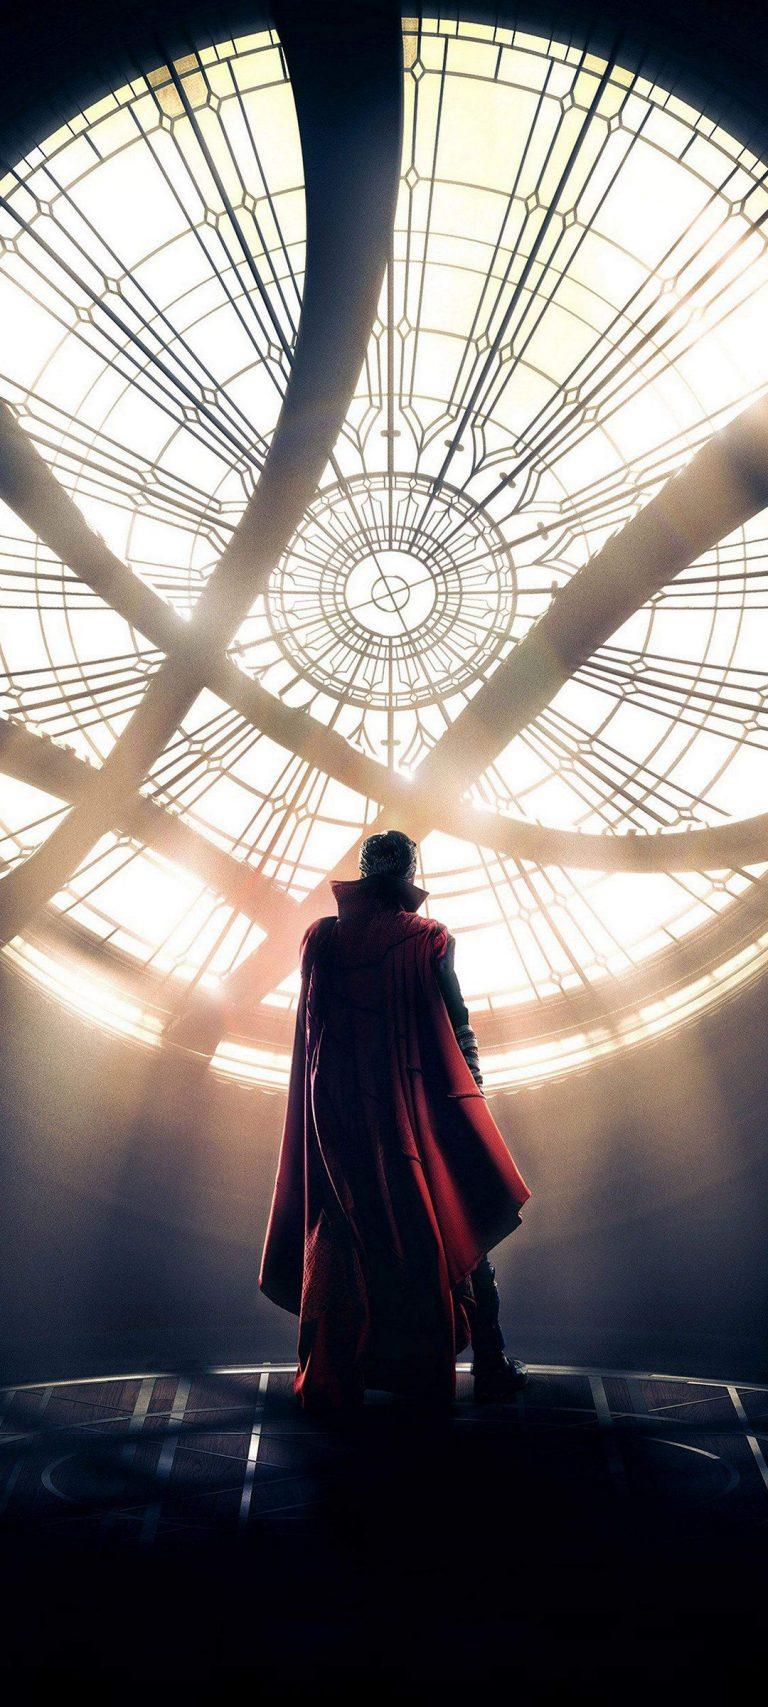 Doctor Strange Superhero 1080x2400 768x1707